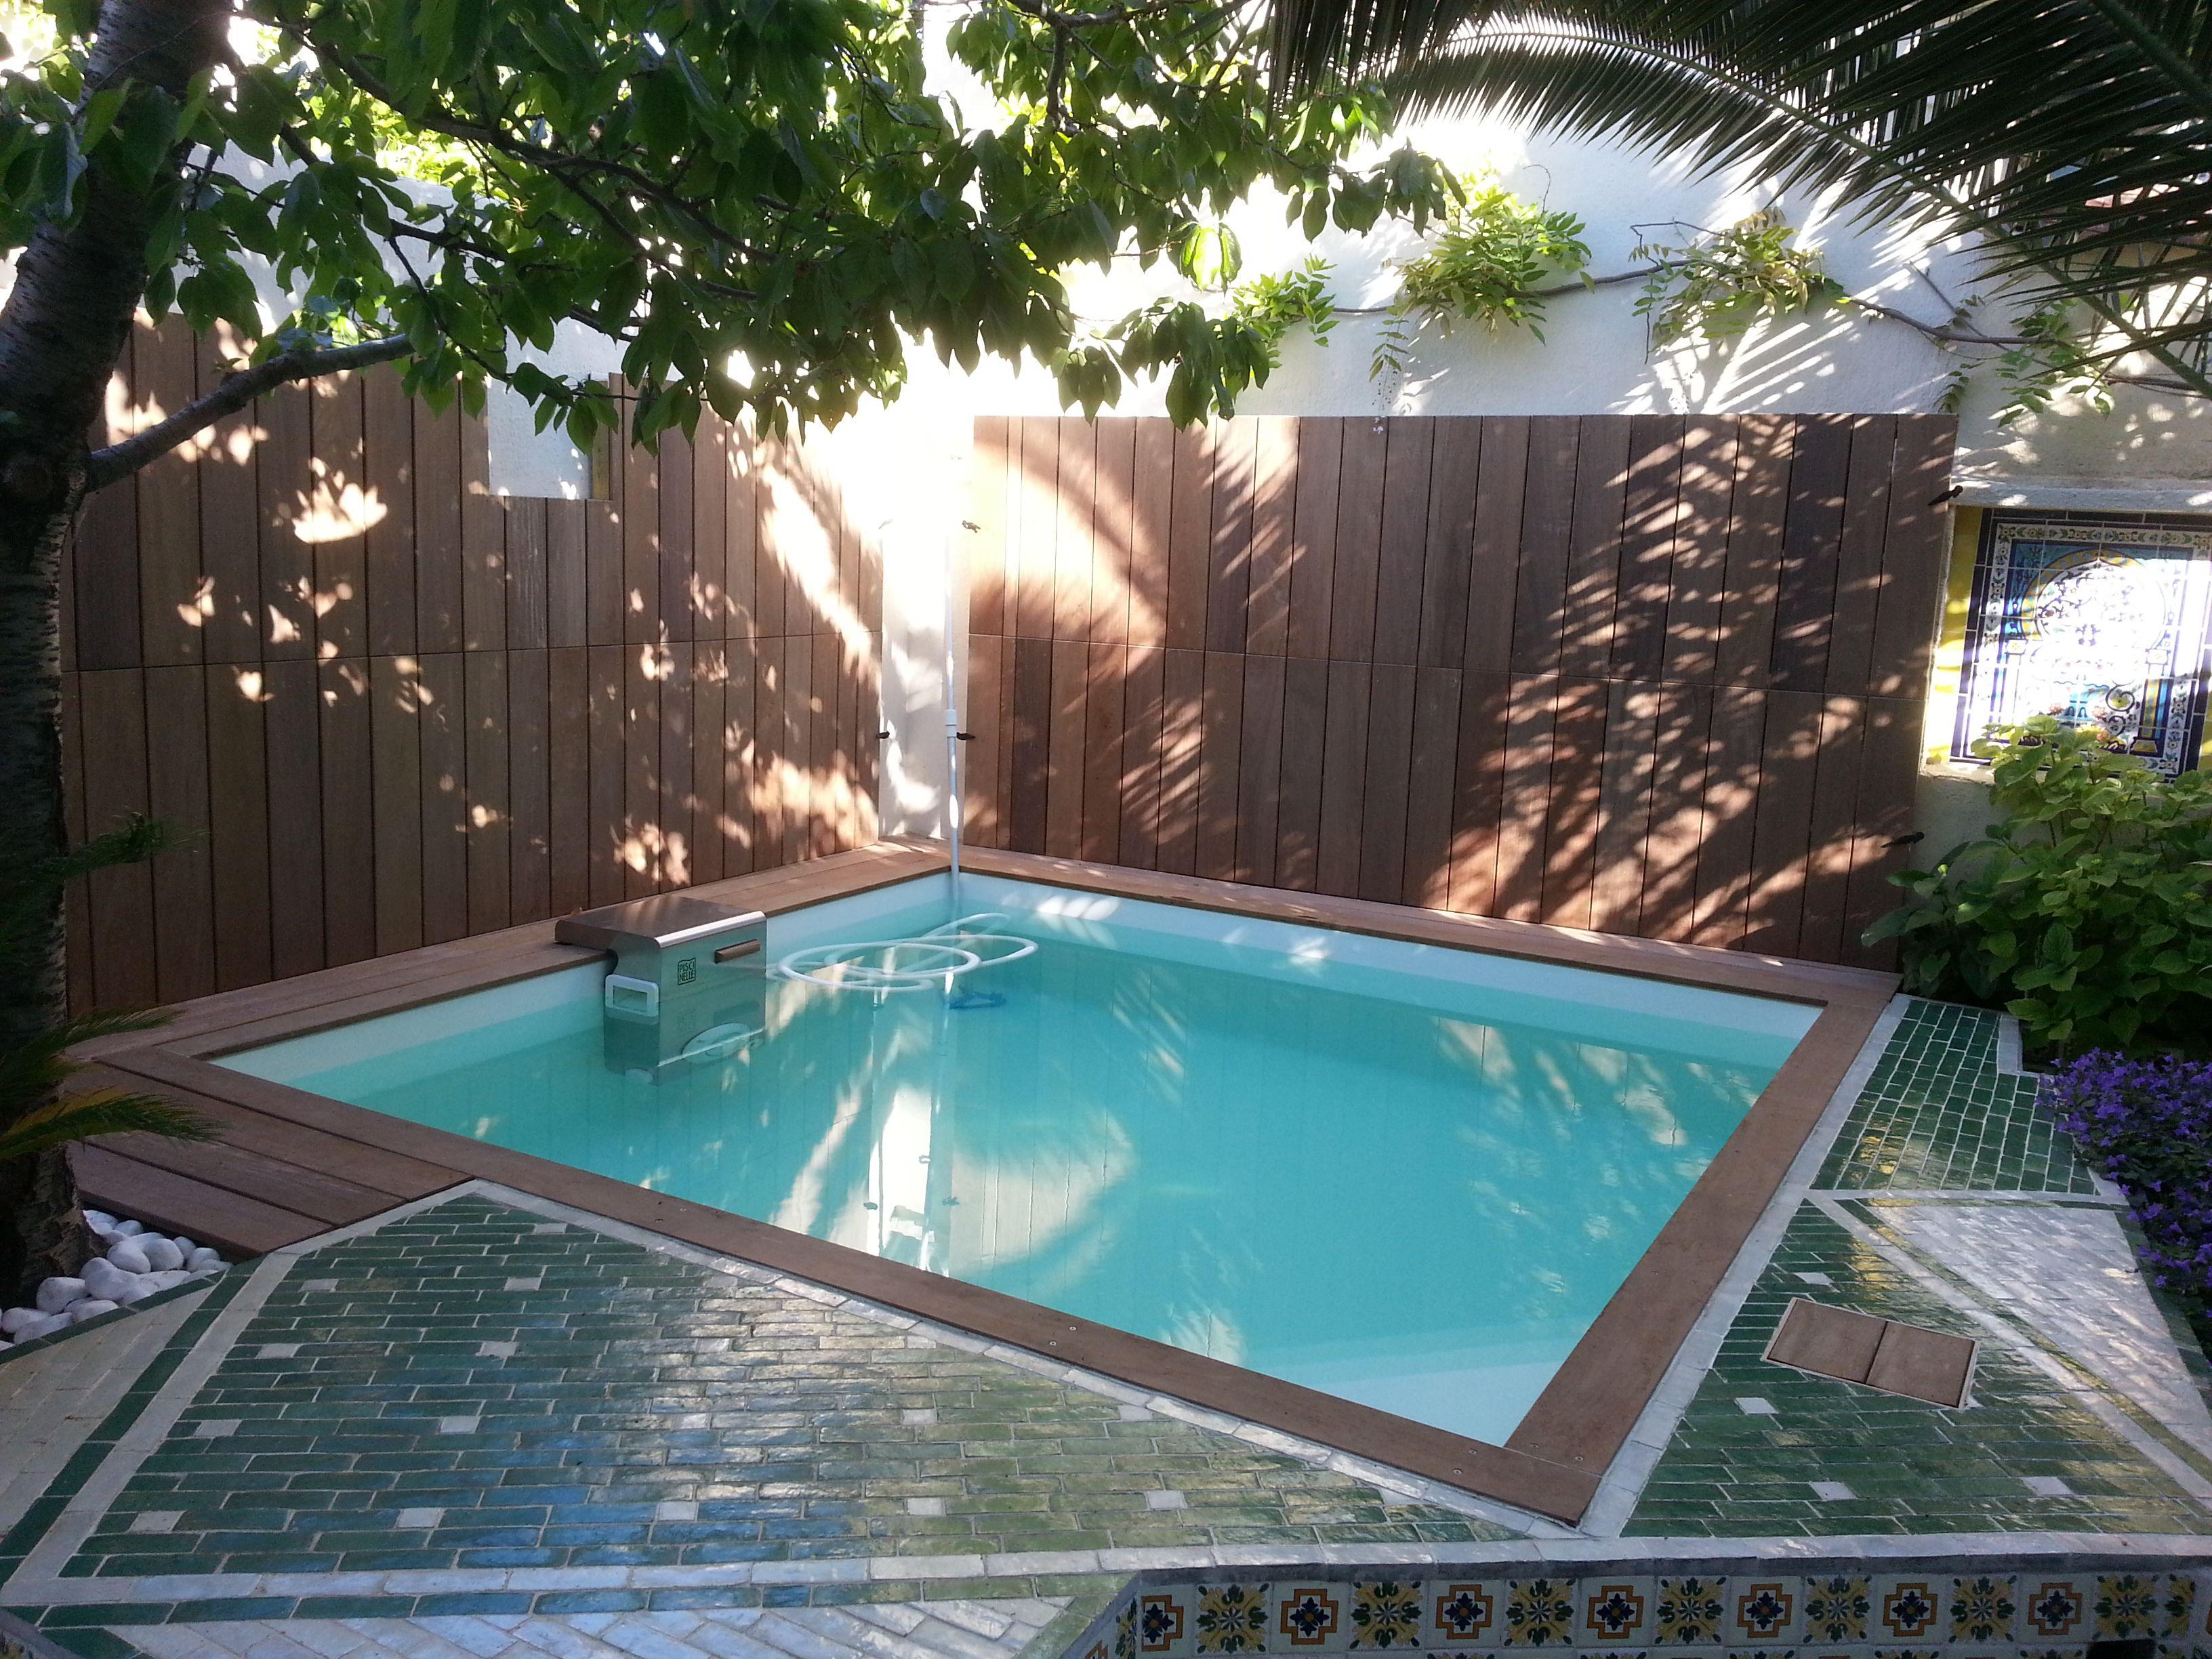 luxe piscine enterr e pour petit jardin 2018 piscine. Black Bedroom Furniture Sets. Home Design Ideas